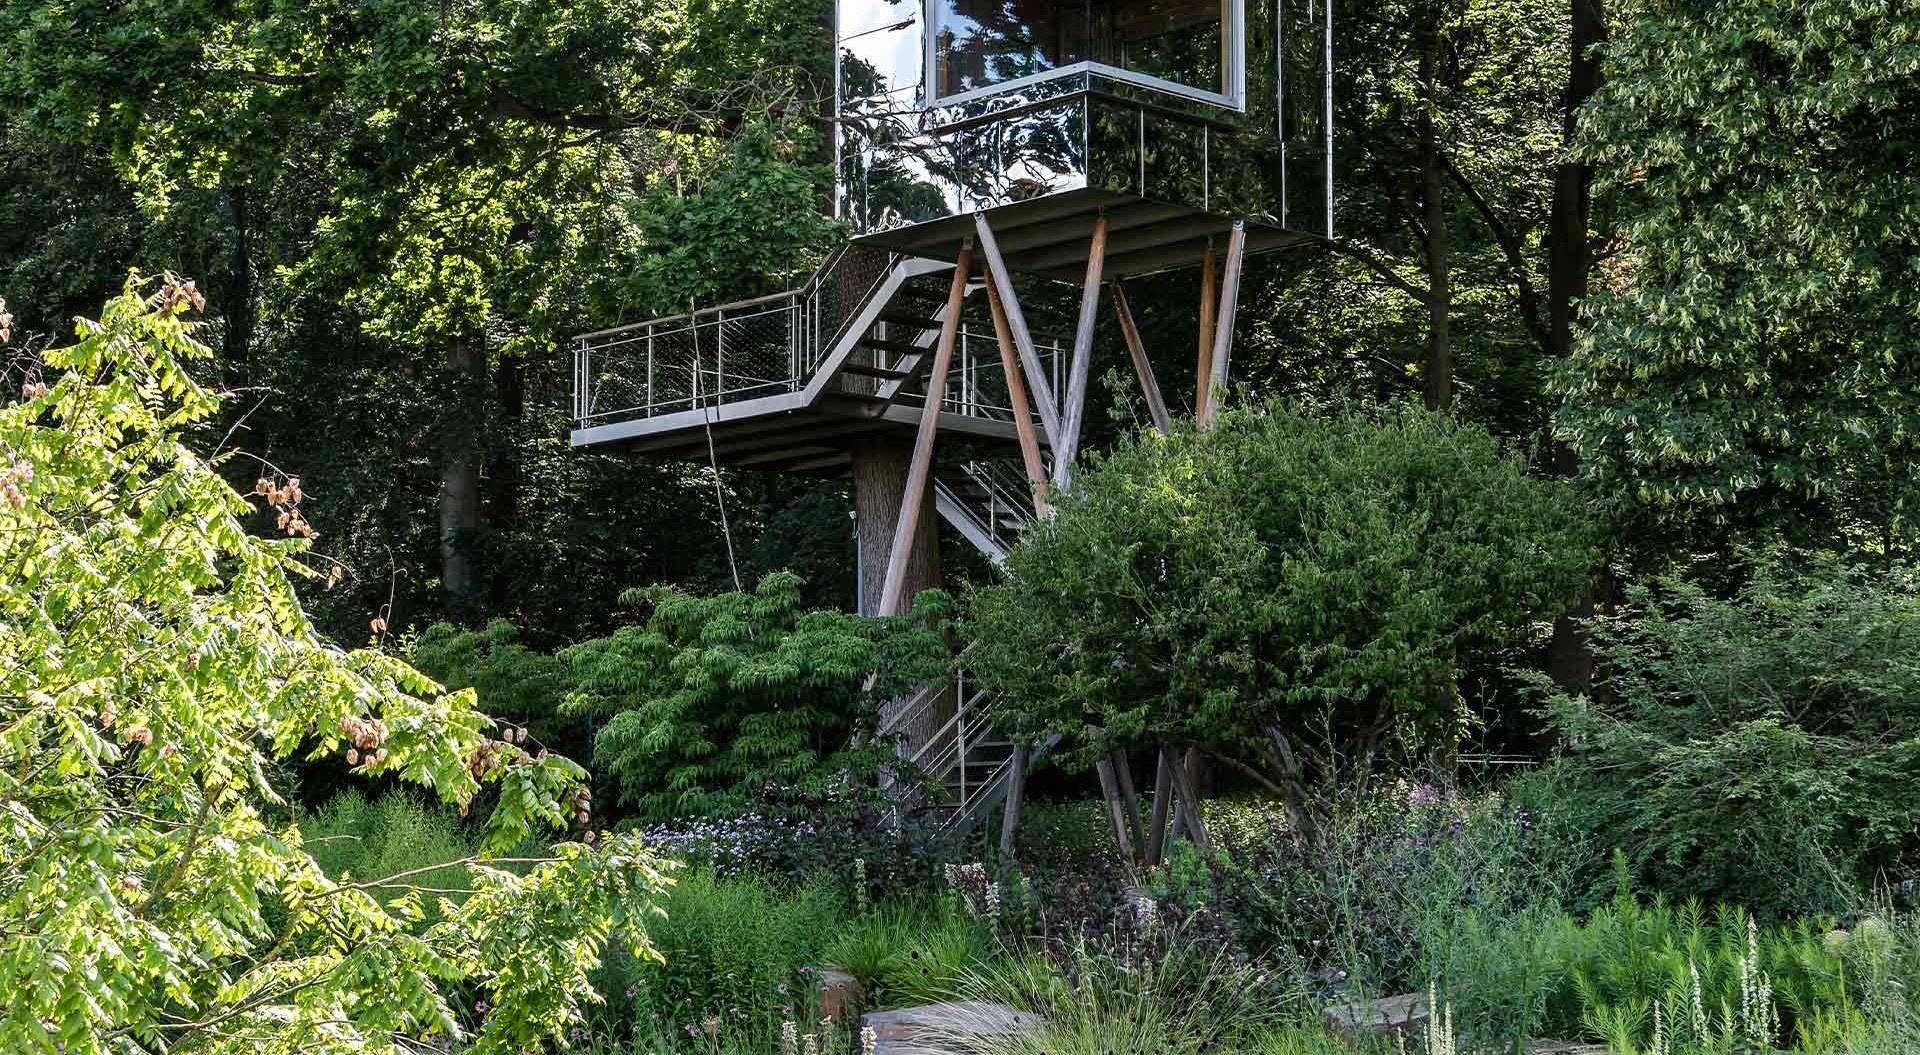 Modern glass-wood tree house in lush green surroundings